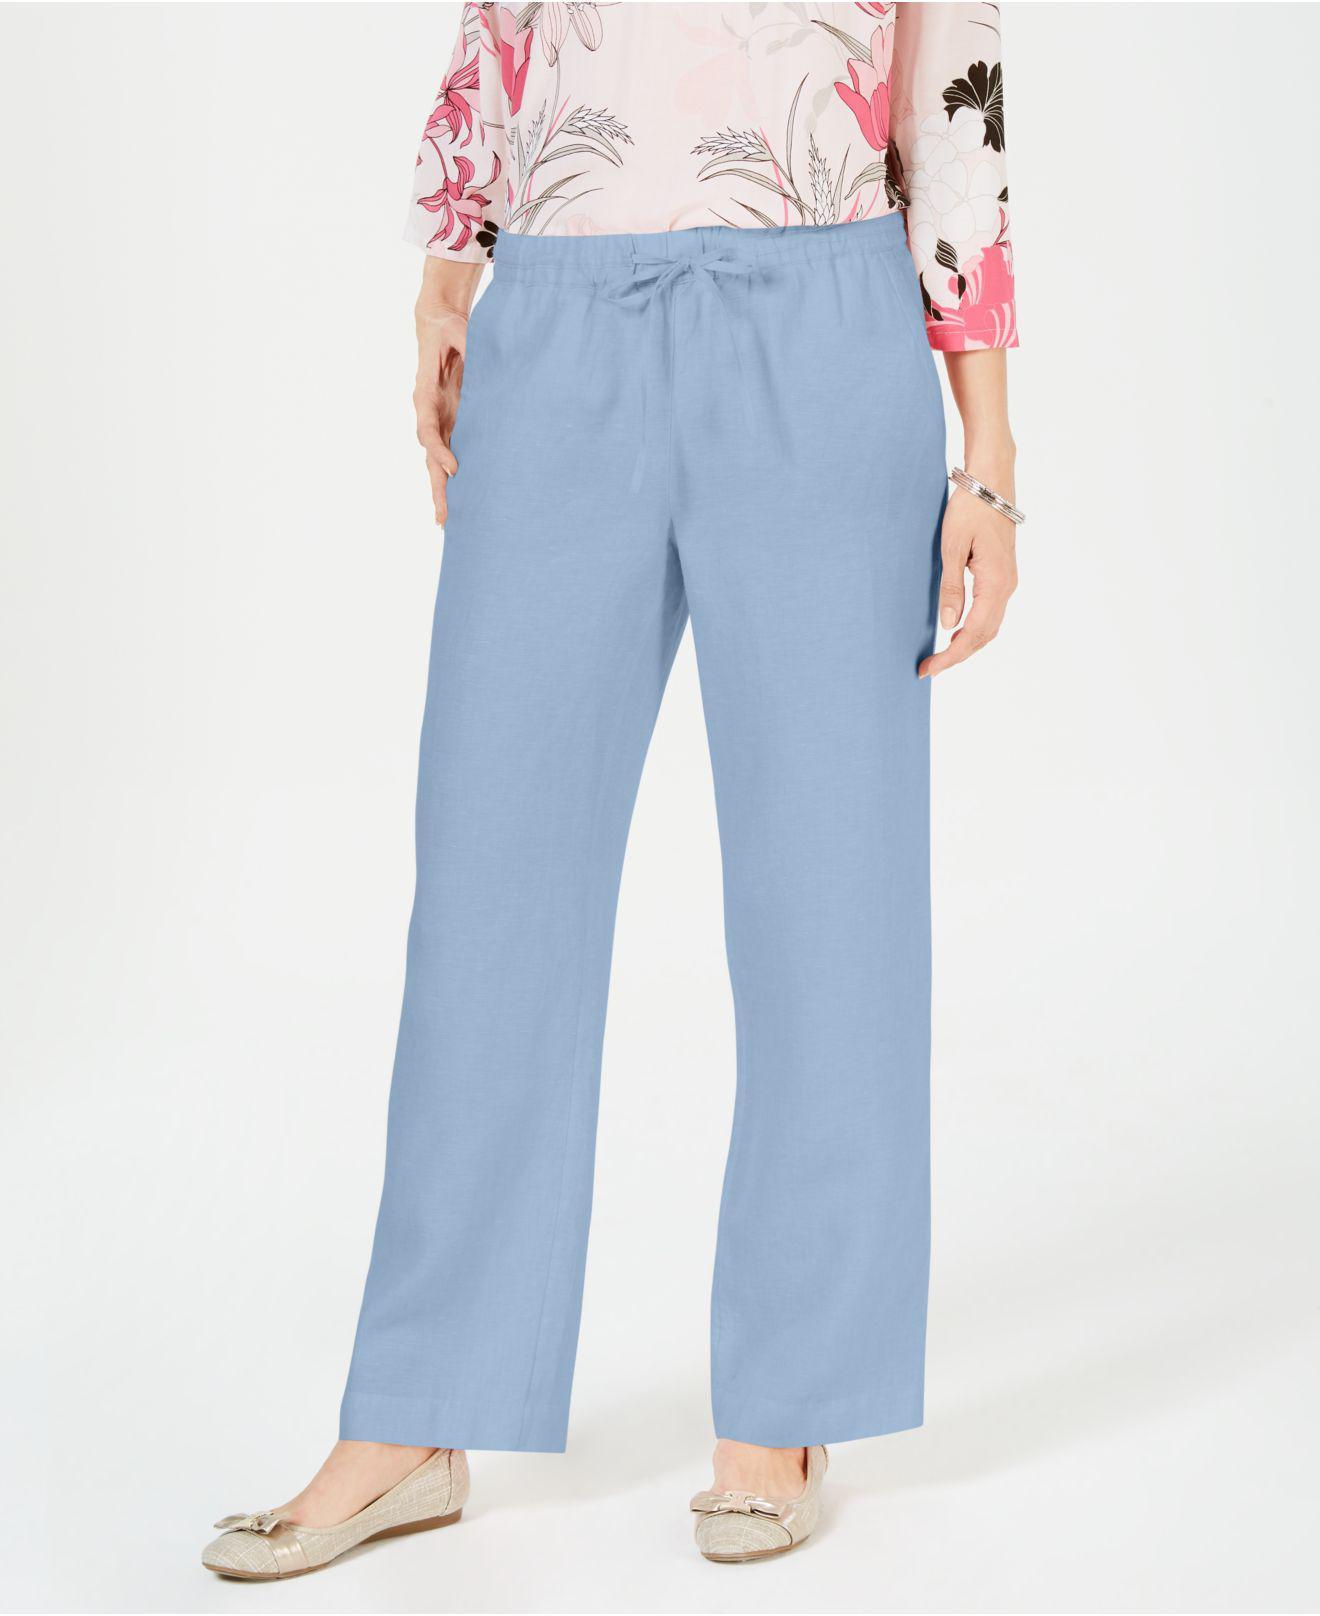 238ee760fbf96 Lyst - Charter Club Linen Petite Drawstring Pants